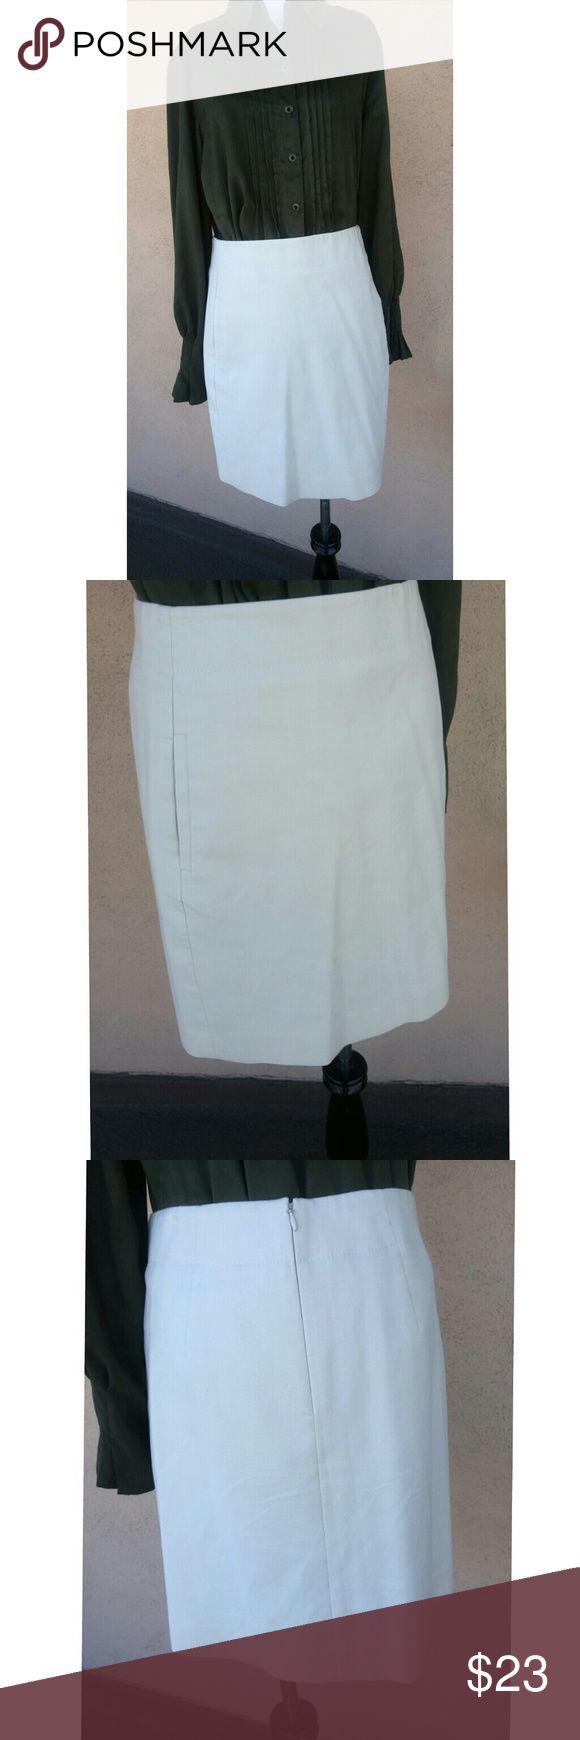 "LOFT pencil skirt Khaki pencil skirt with two pockets! Size 2, measures 18.5"" from waistline to hem. Waist measure 29"" flat. LOFT Skirts Pencil"